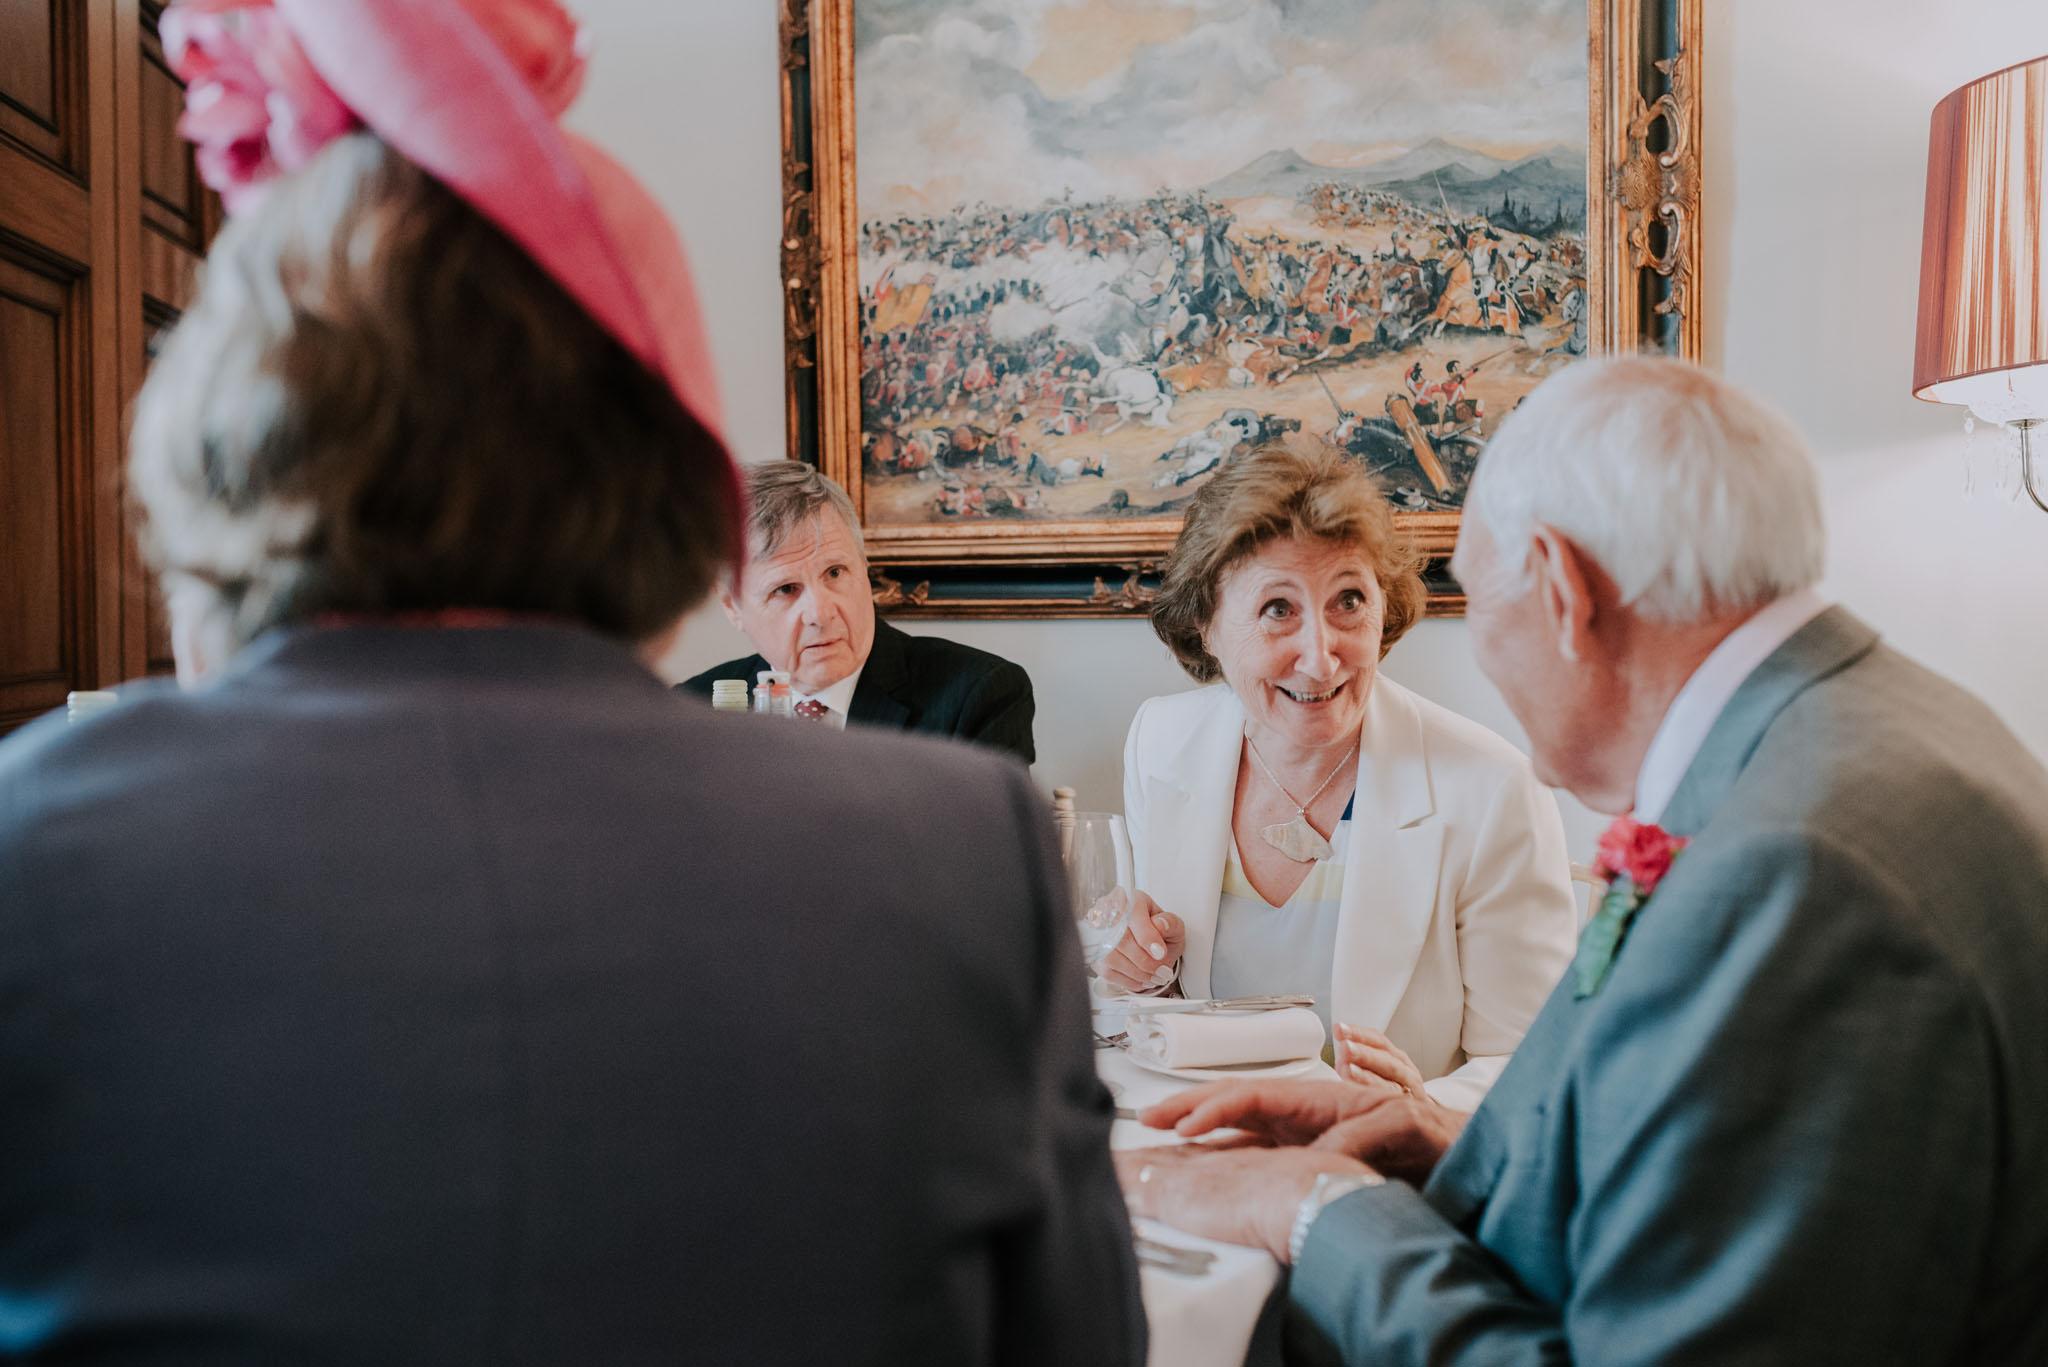 wedding-photographer-glewstone-court-hereford-scott-stockwell-photography375.jpg